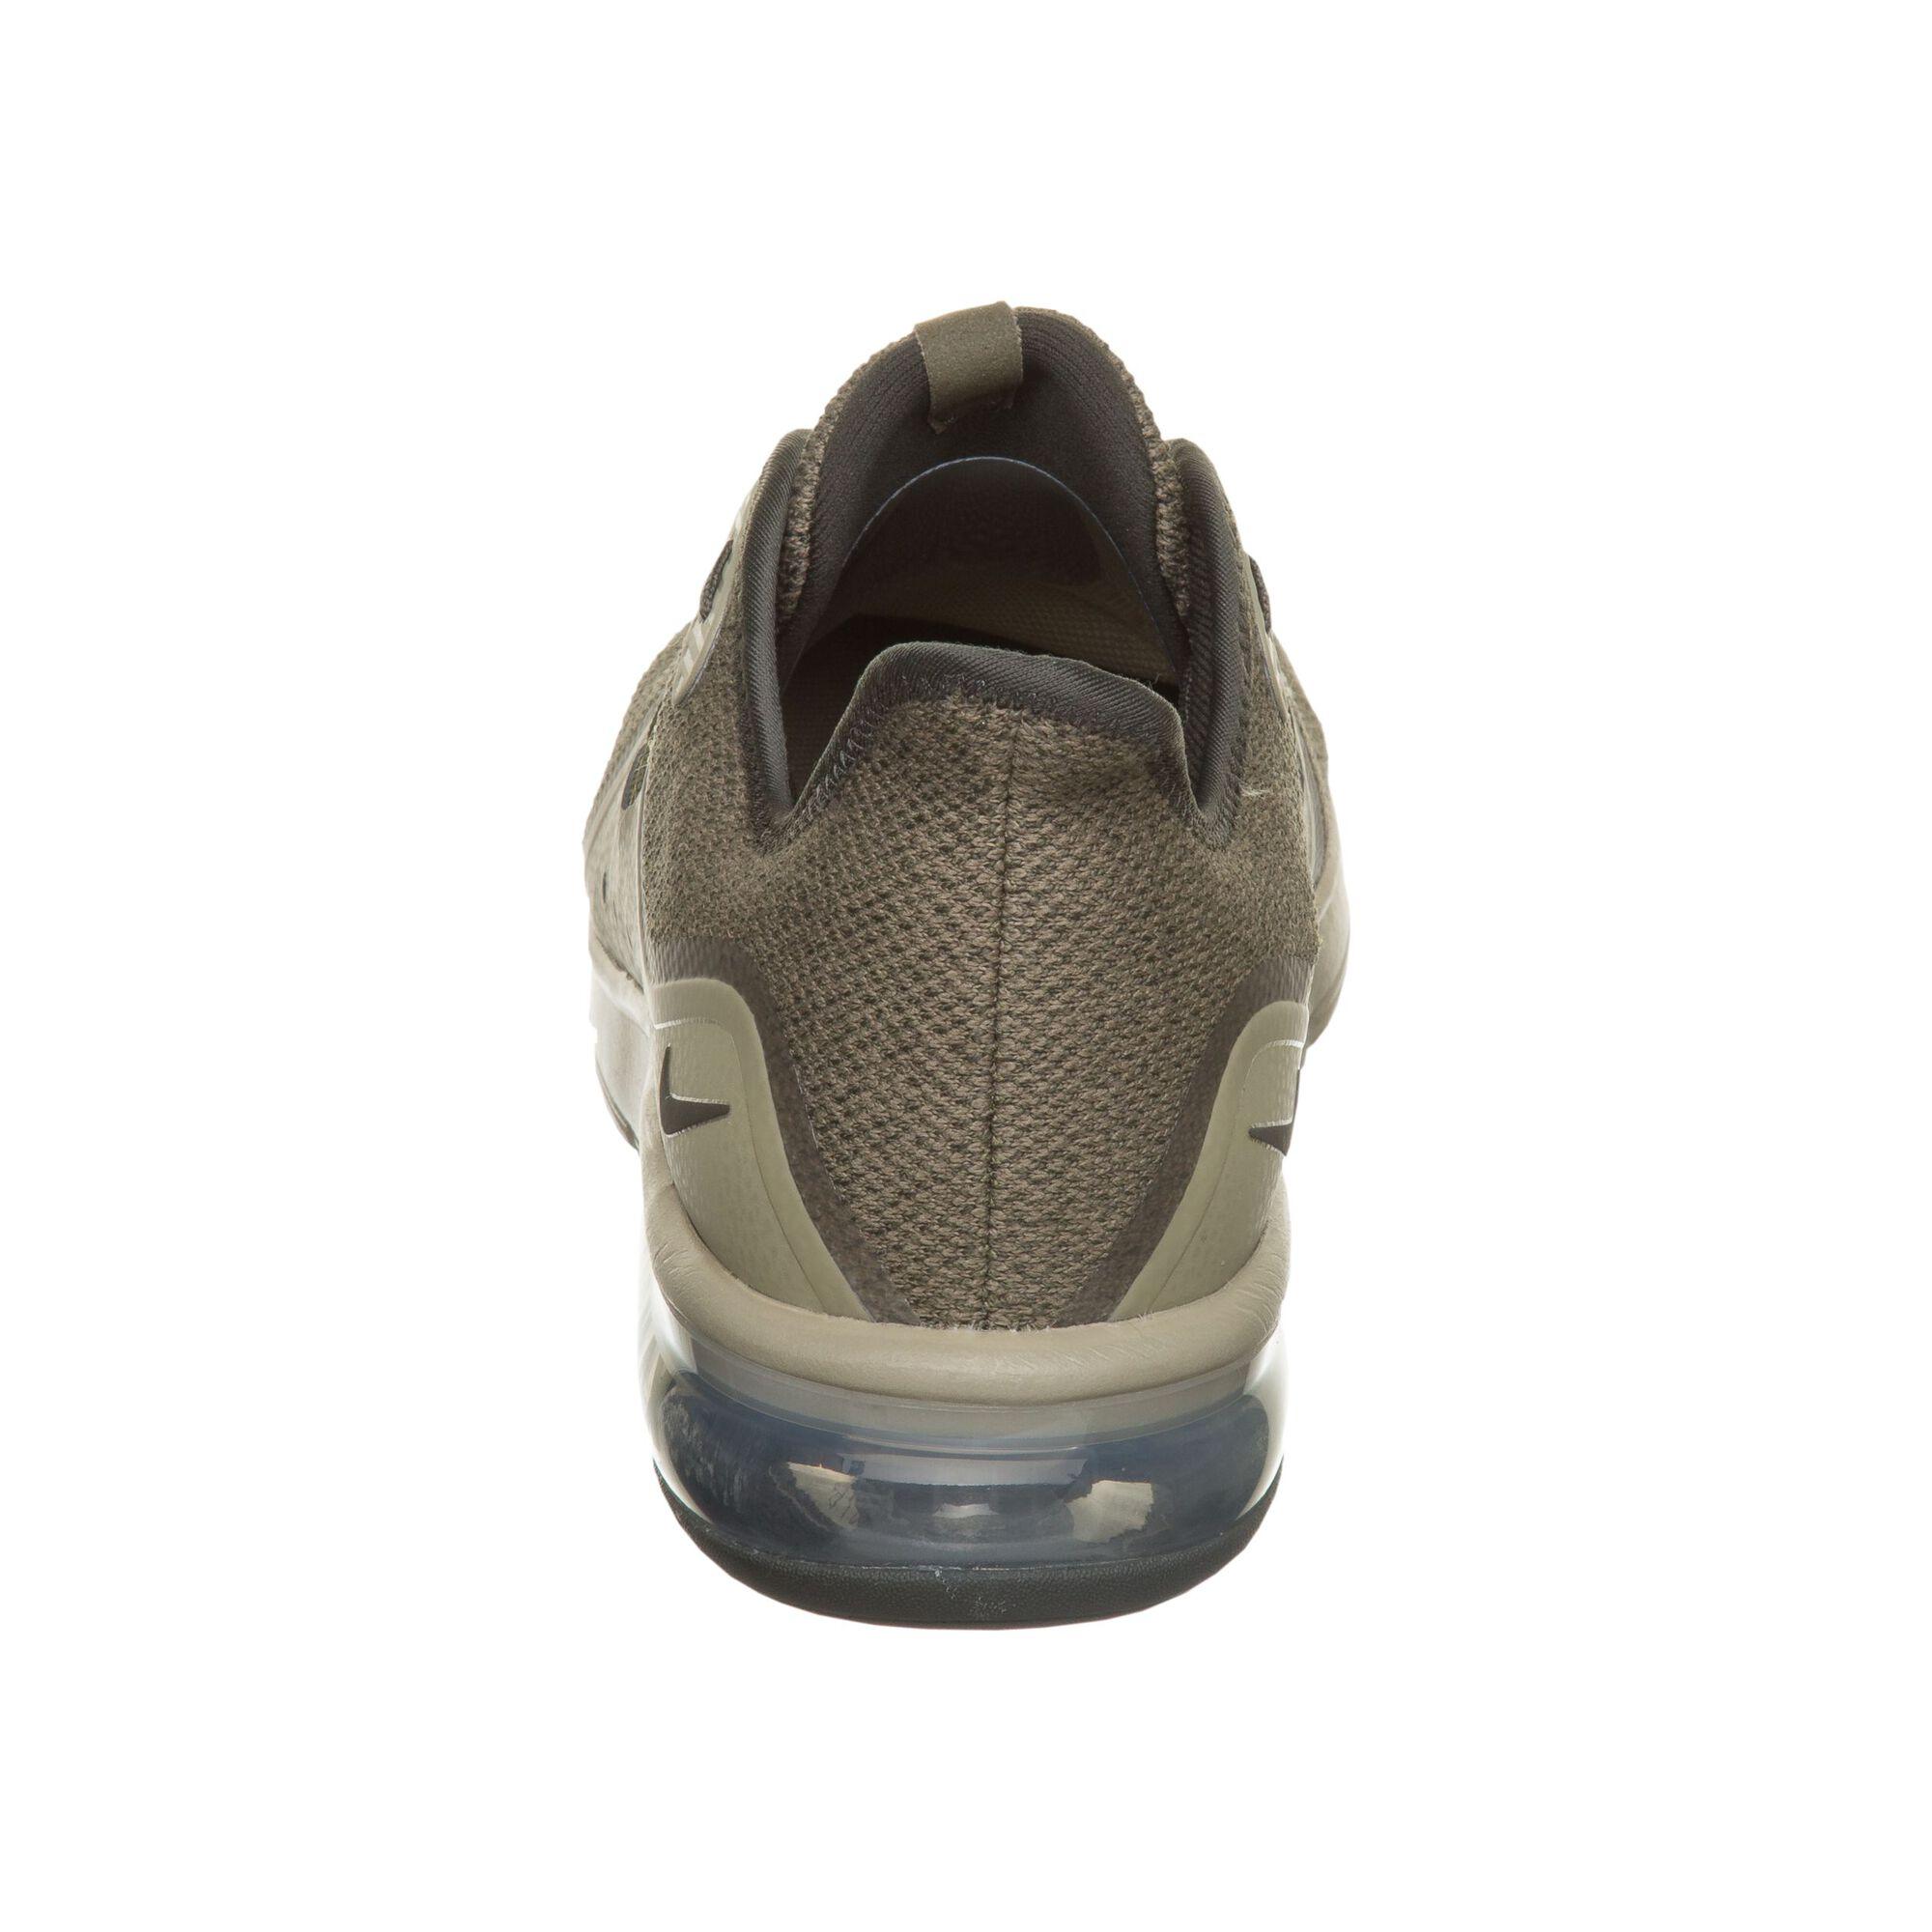 buy online f535a b20f0 Nike; Nike; Nike; Nike; Nike; Nike; Nike; Nike; Nike; Nike. Air Max Sequent  3 ...